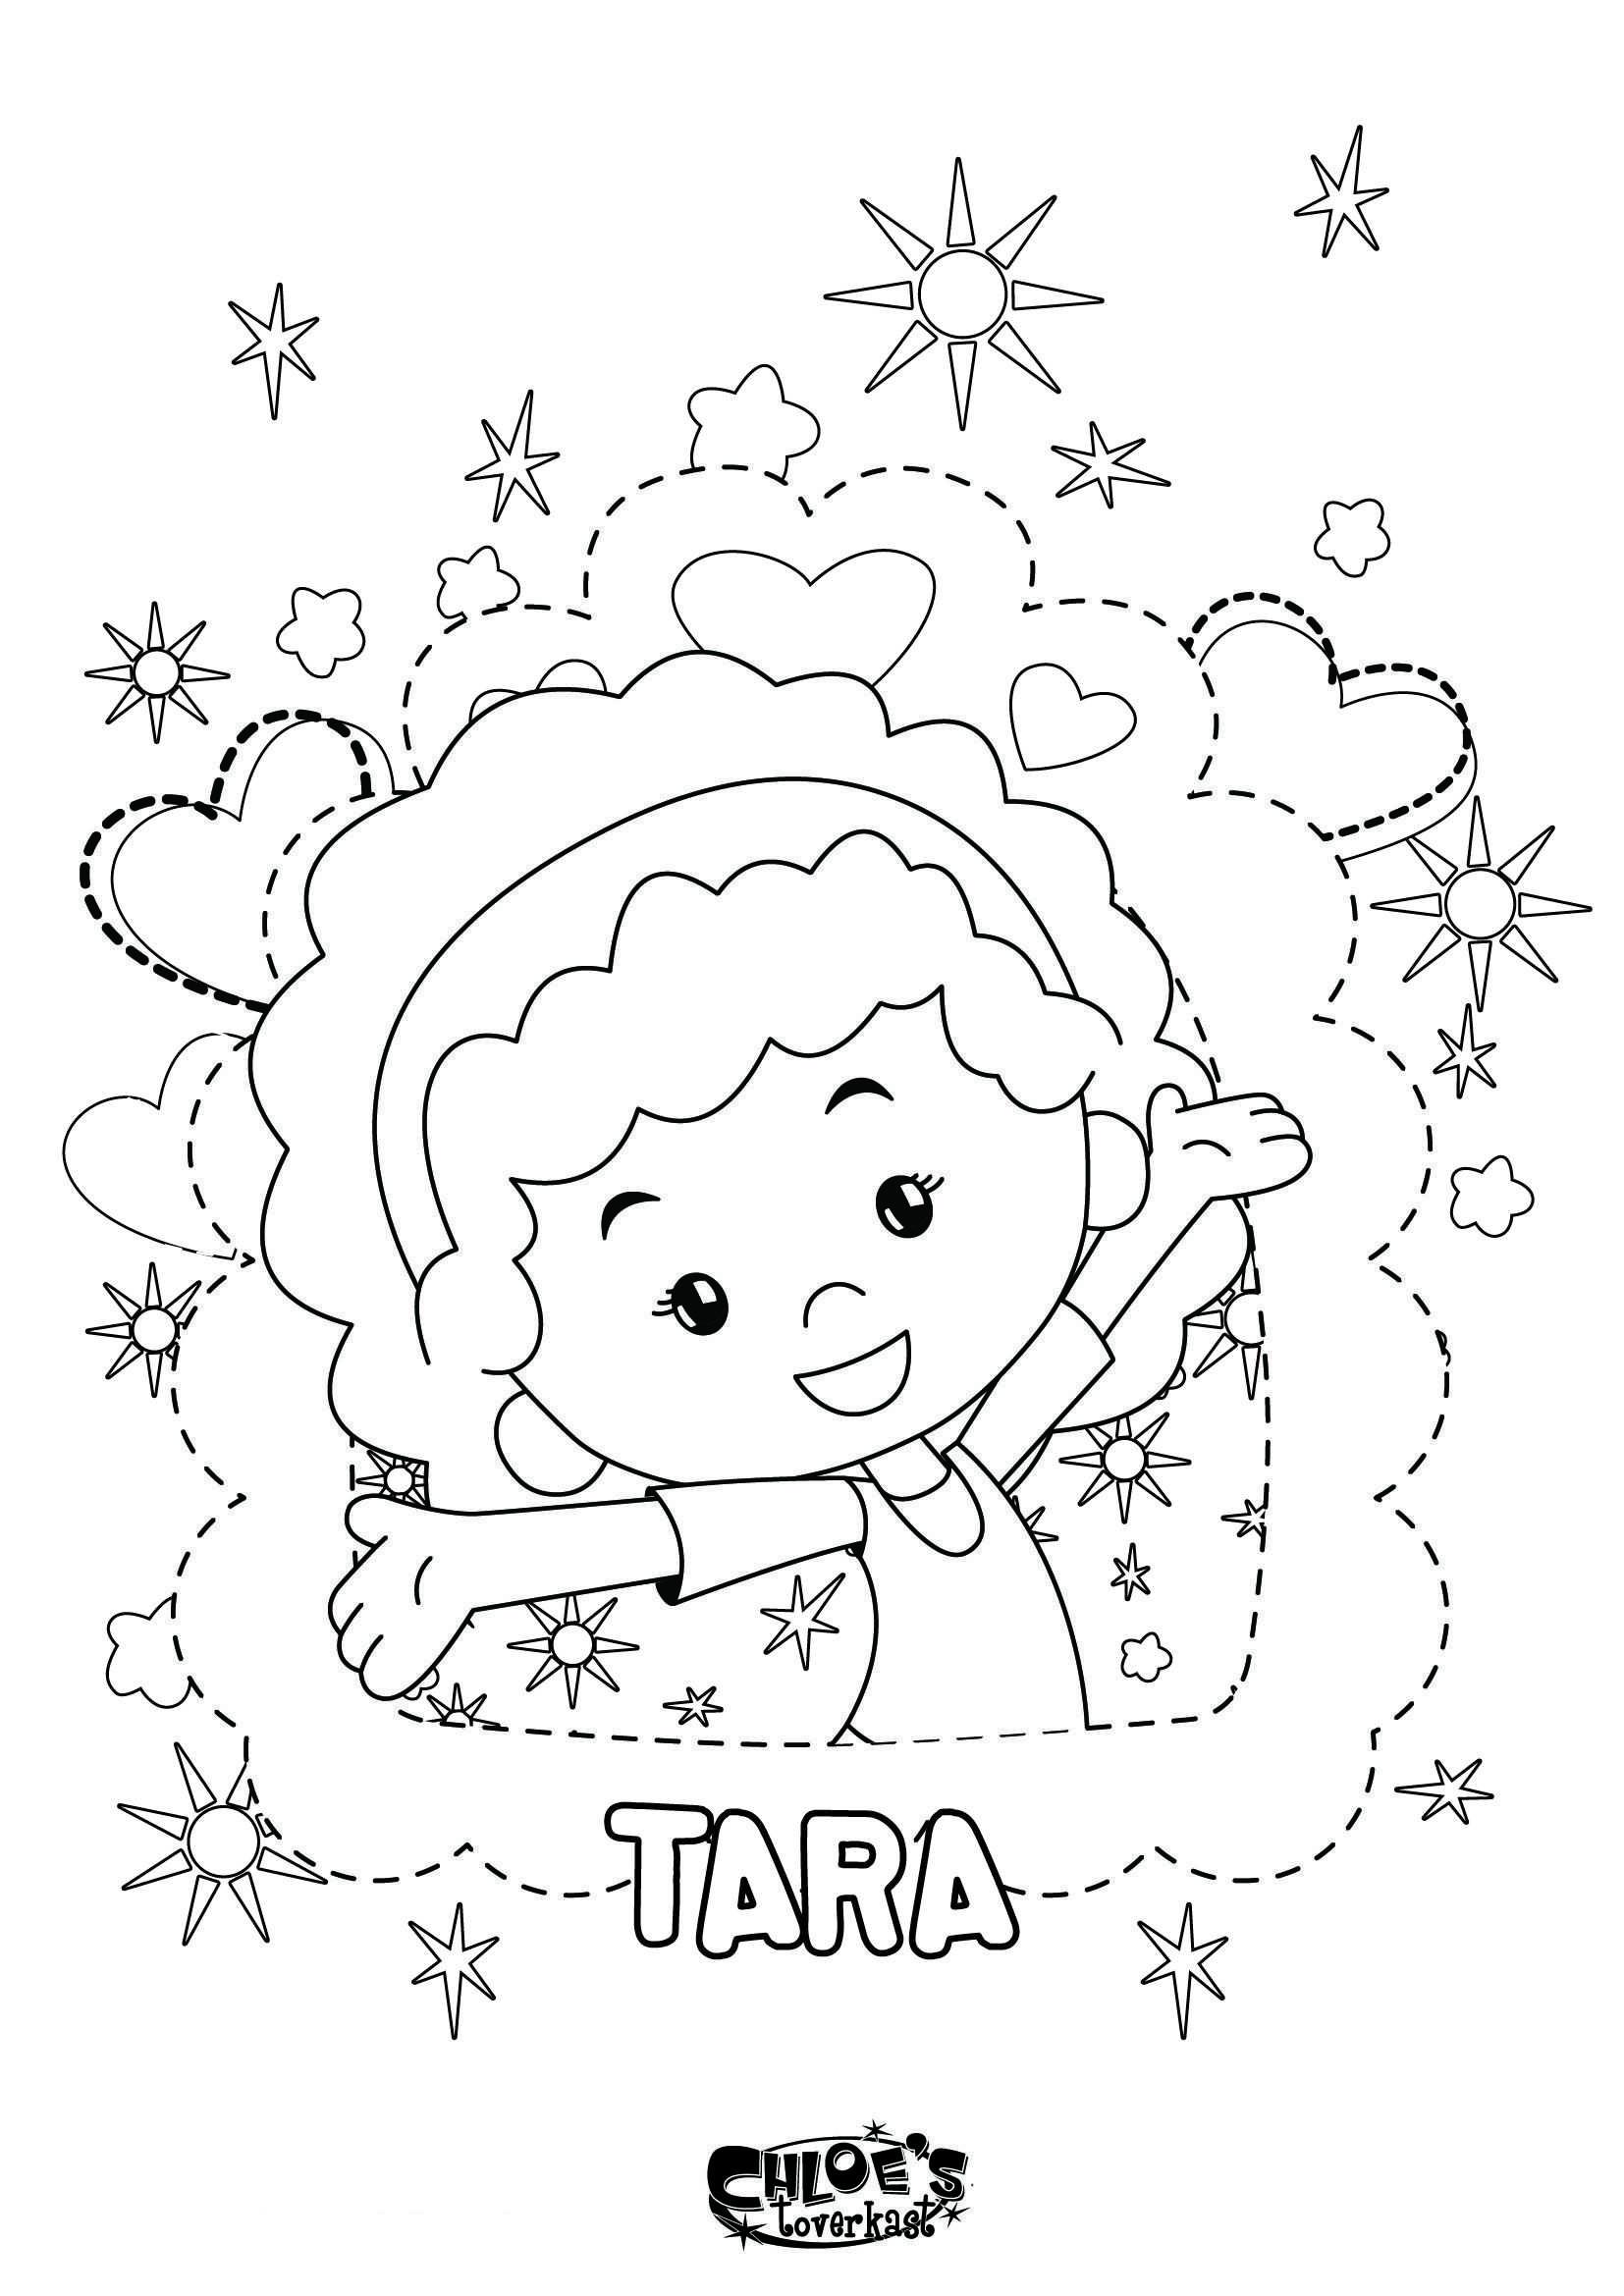 Een Kleurplaat Van Tara Uit Chloe S Toverkast Leuk Voor Kids